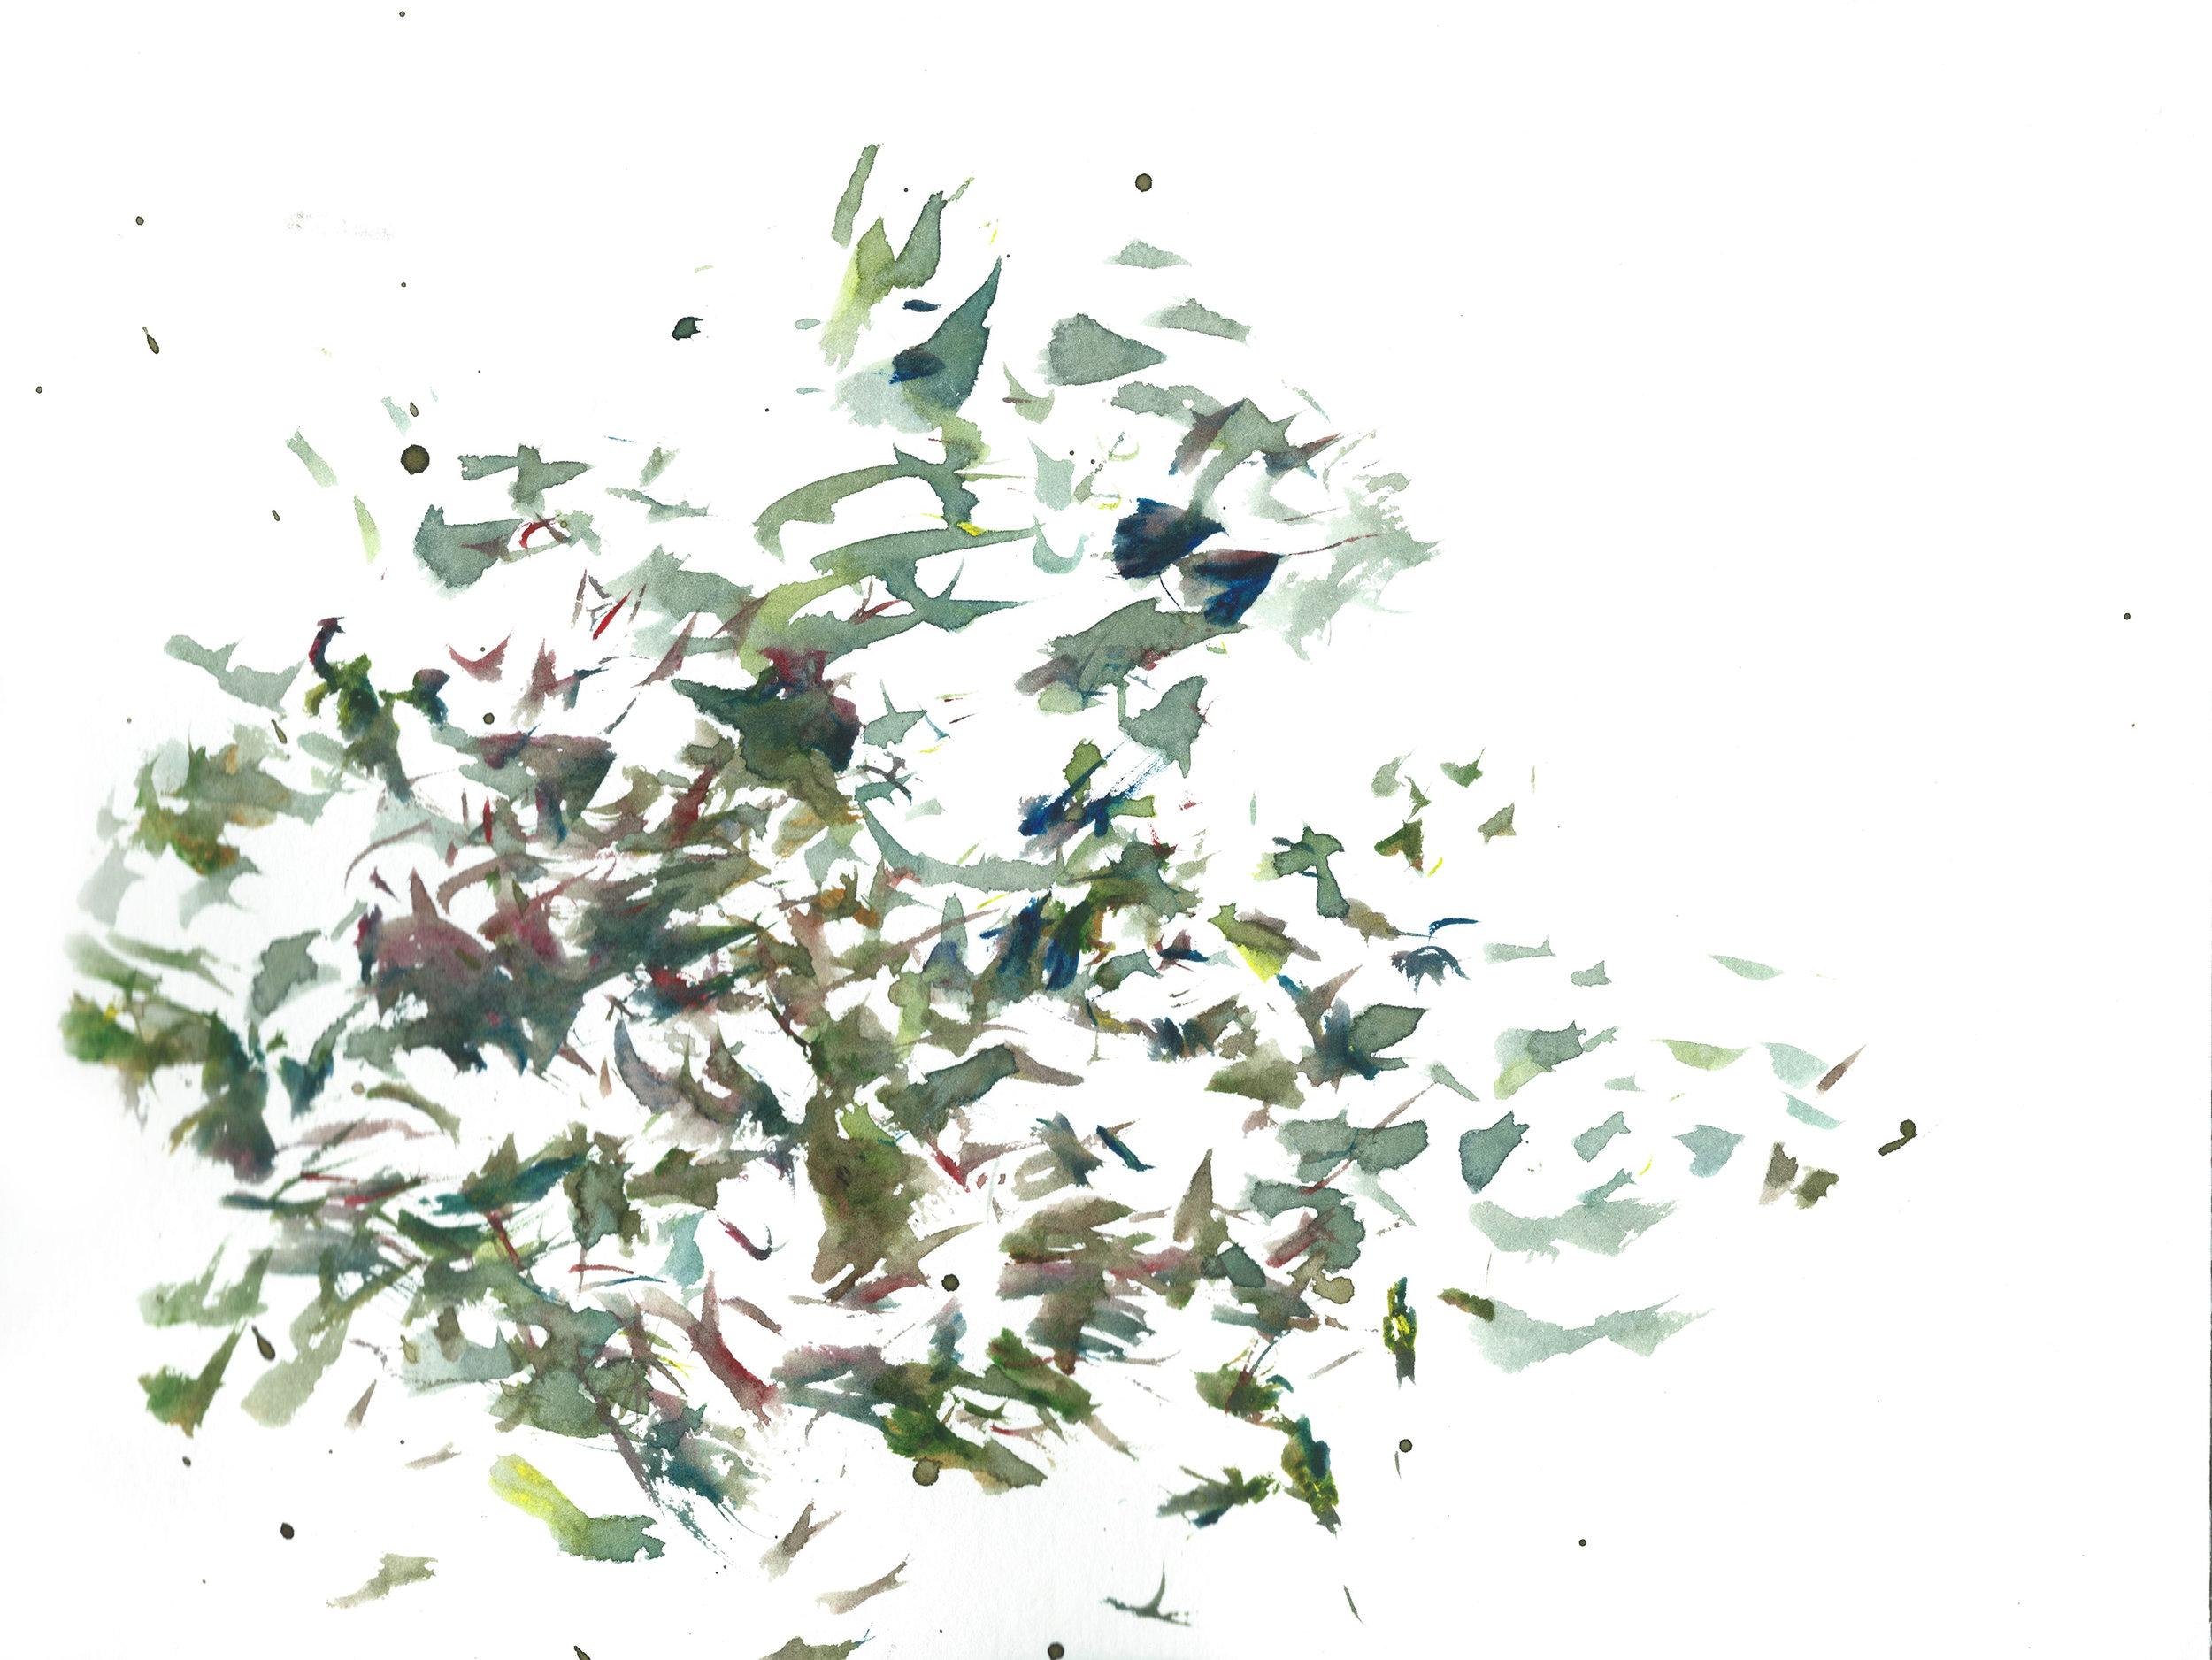 Stephen Thomas, Yoga, Yoga-Svarupa, watercolor 18